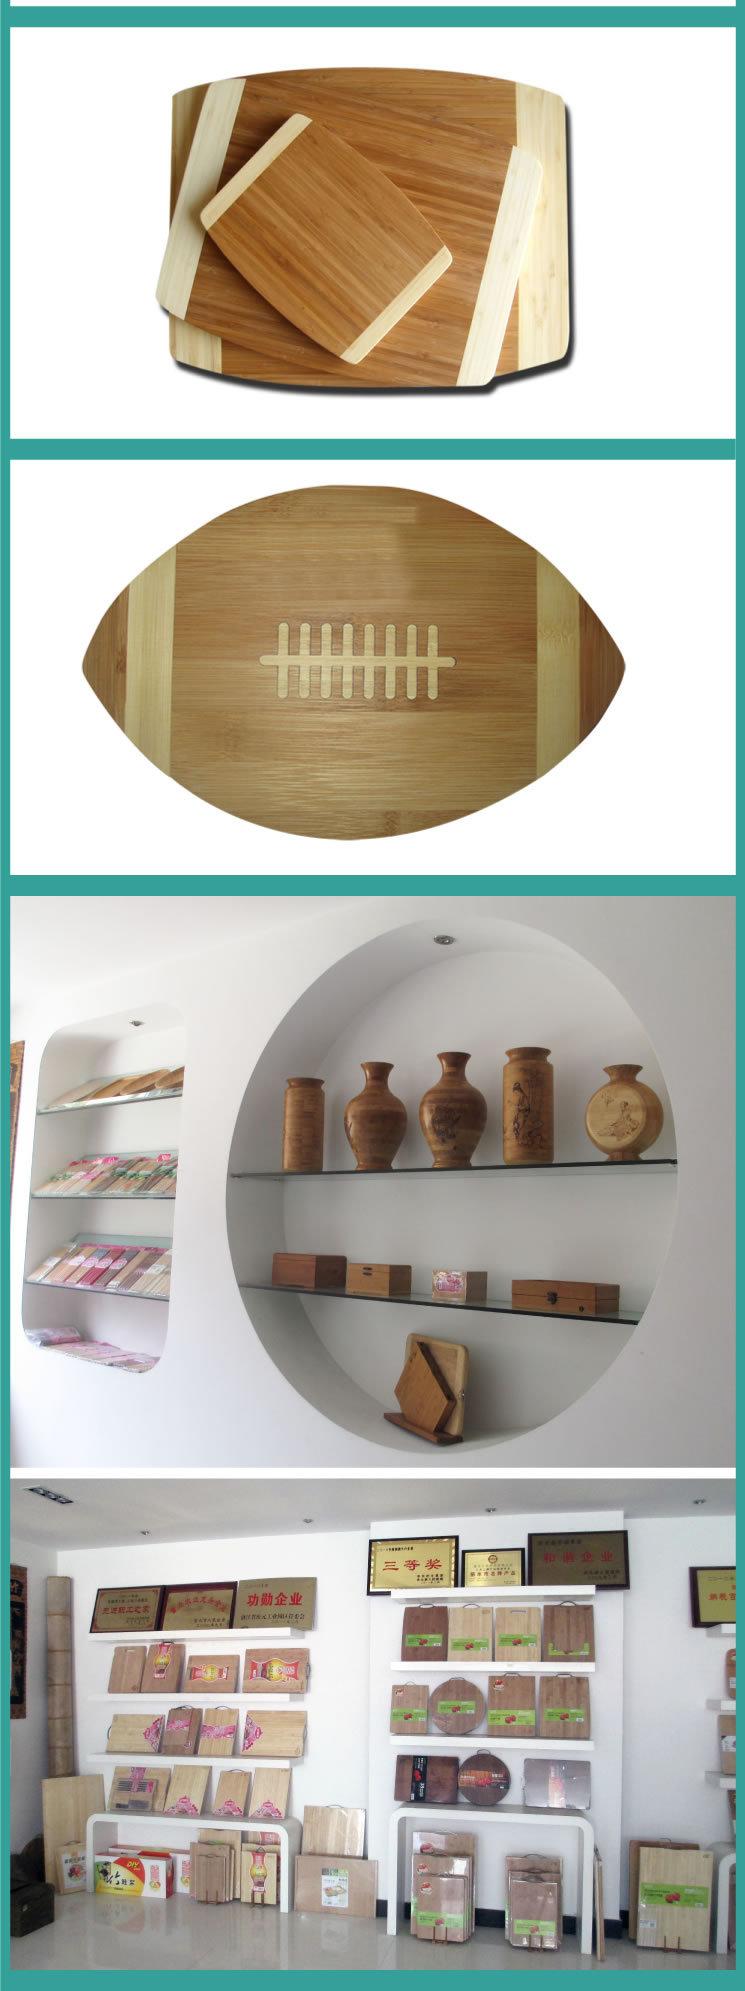 MXHAPPY Bamboo Cutting Board Natural Bamboo Cheese Board set 3 piece custom cutting board